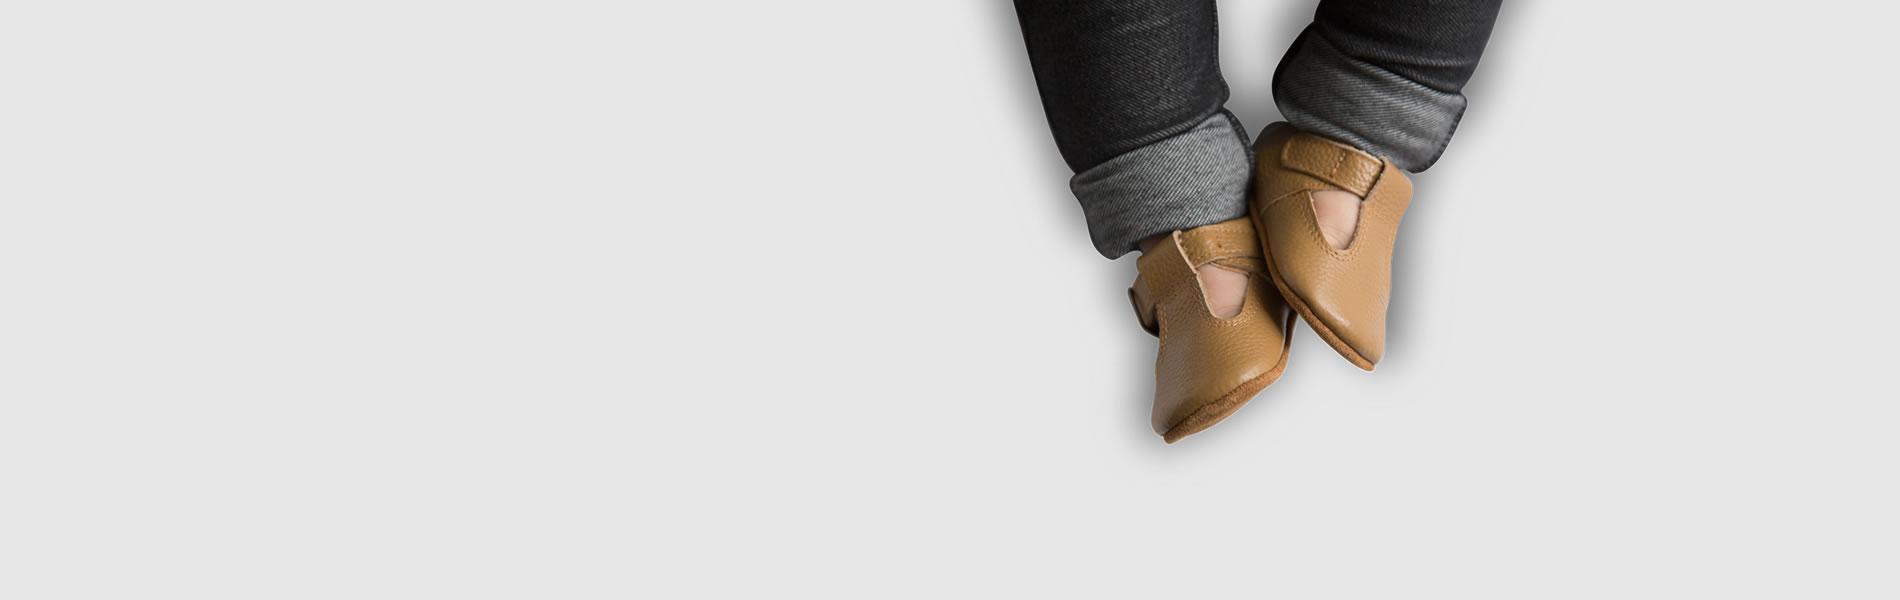 Aston Baby Shaughnessy Shoe Restock